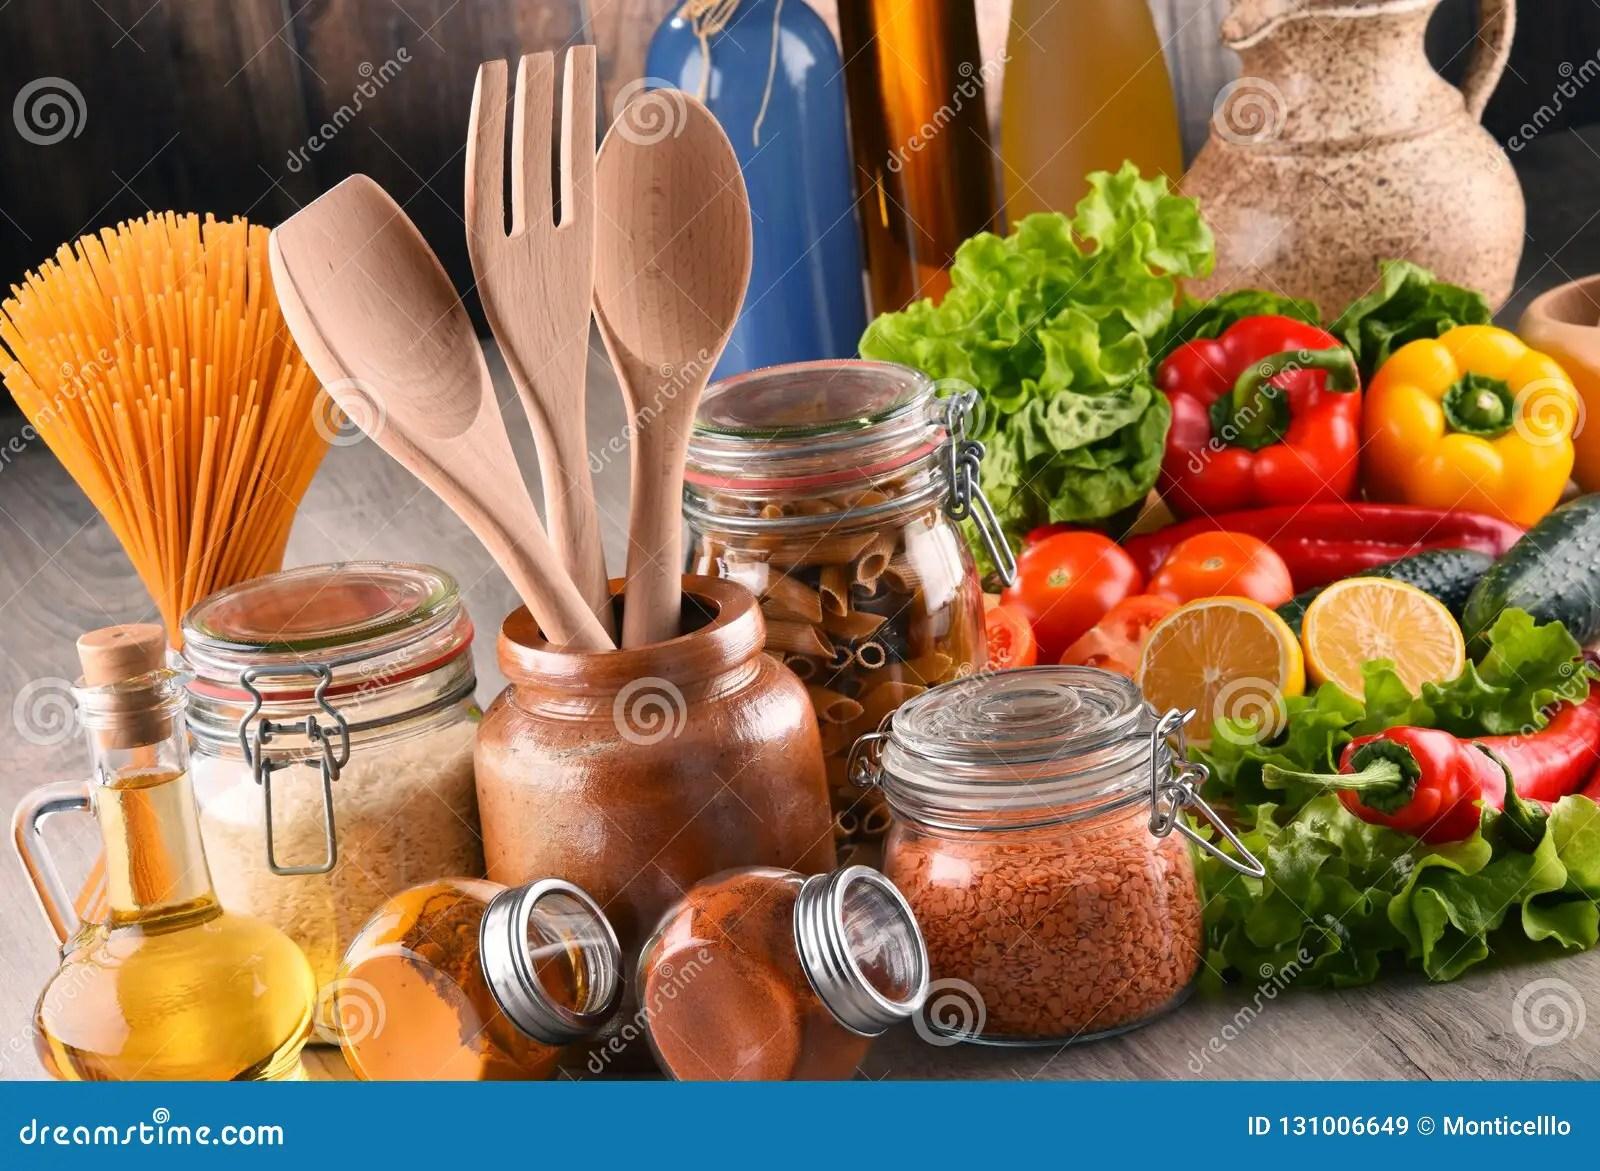 kitchen pantry brookhaven cabinets 与被分类的食品和厨房器物的构成库存图片 图片包括有面条 bakeshop 与被分类的食品和厨房器物的构成